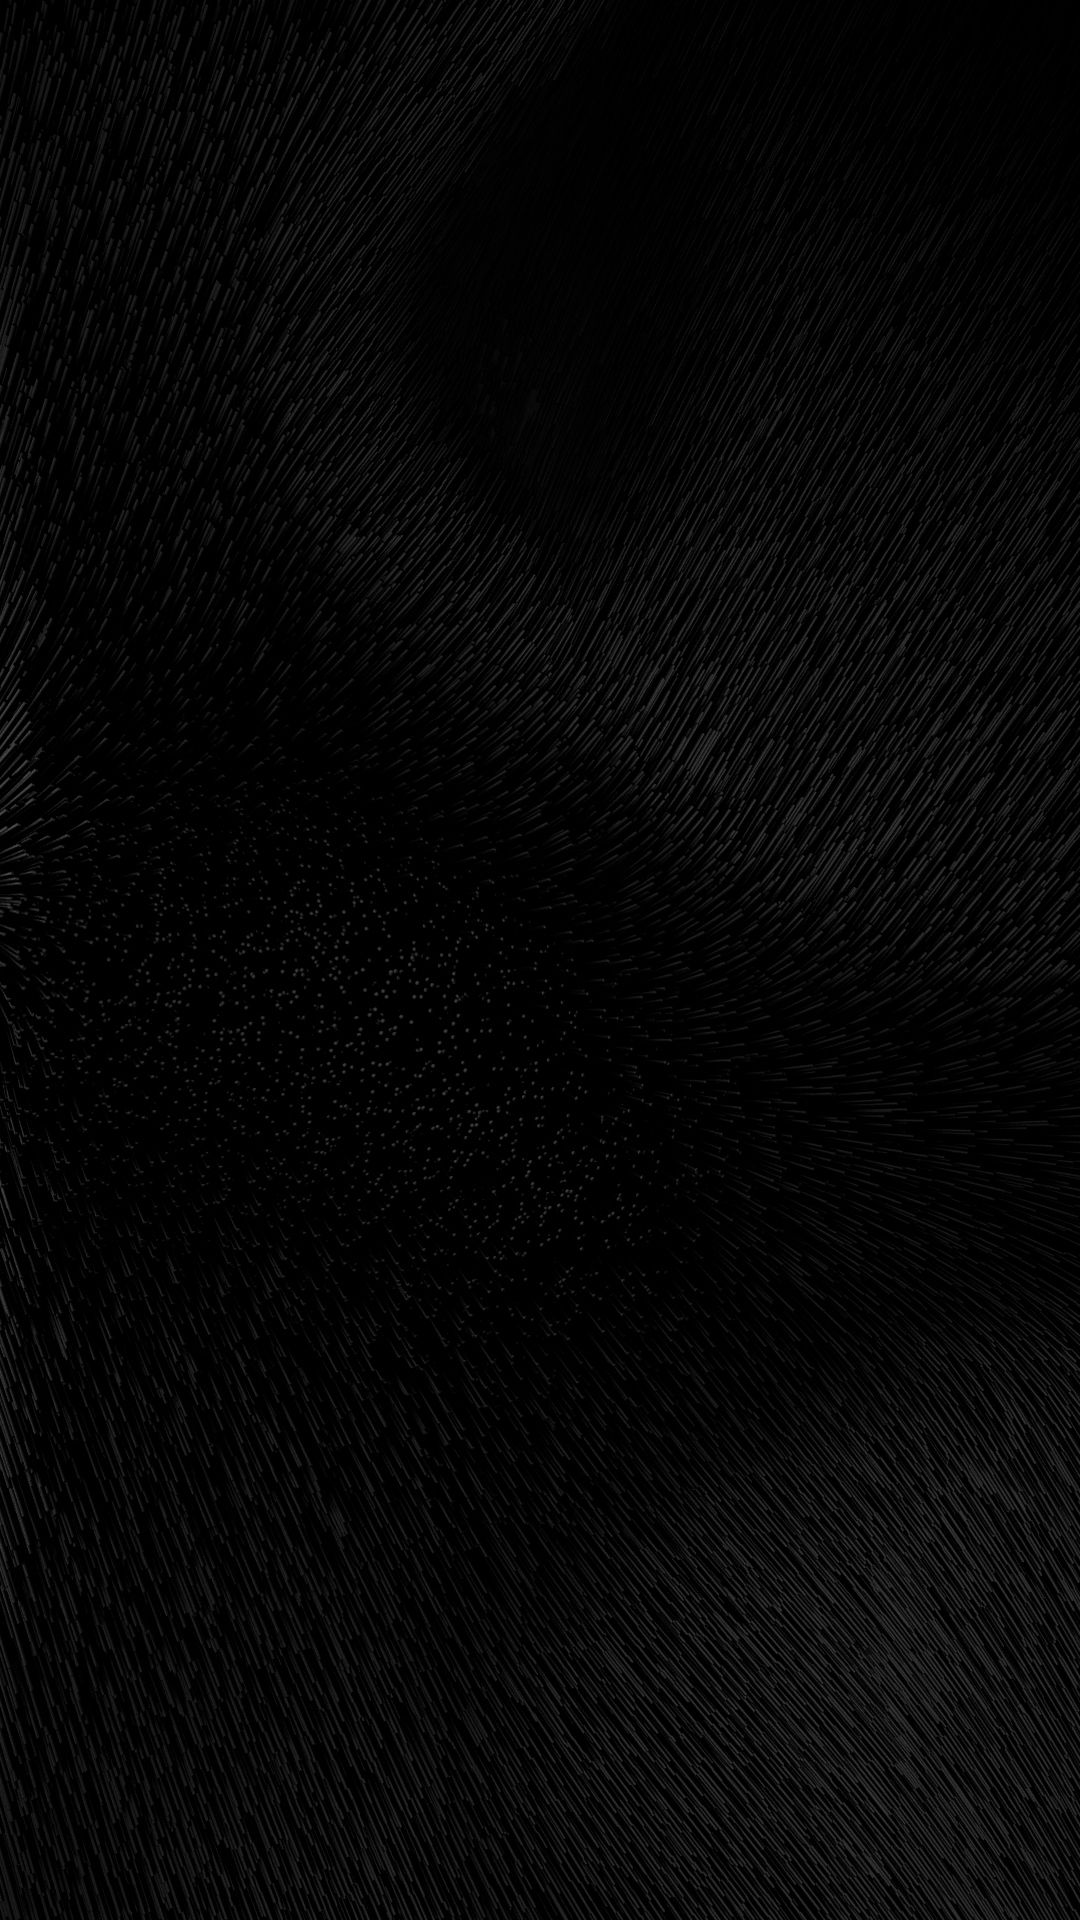 Black Wallpaper Iphone Aesthetic Hd